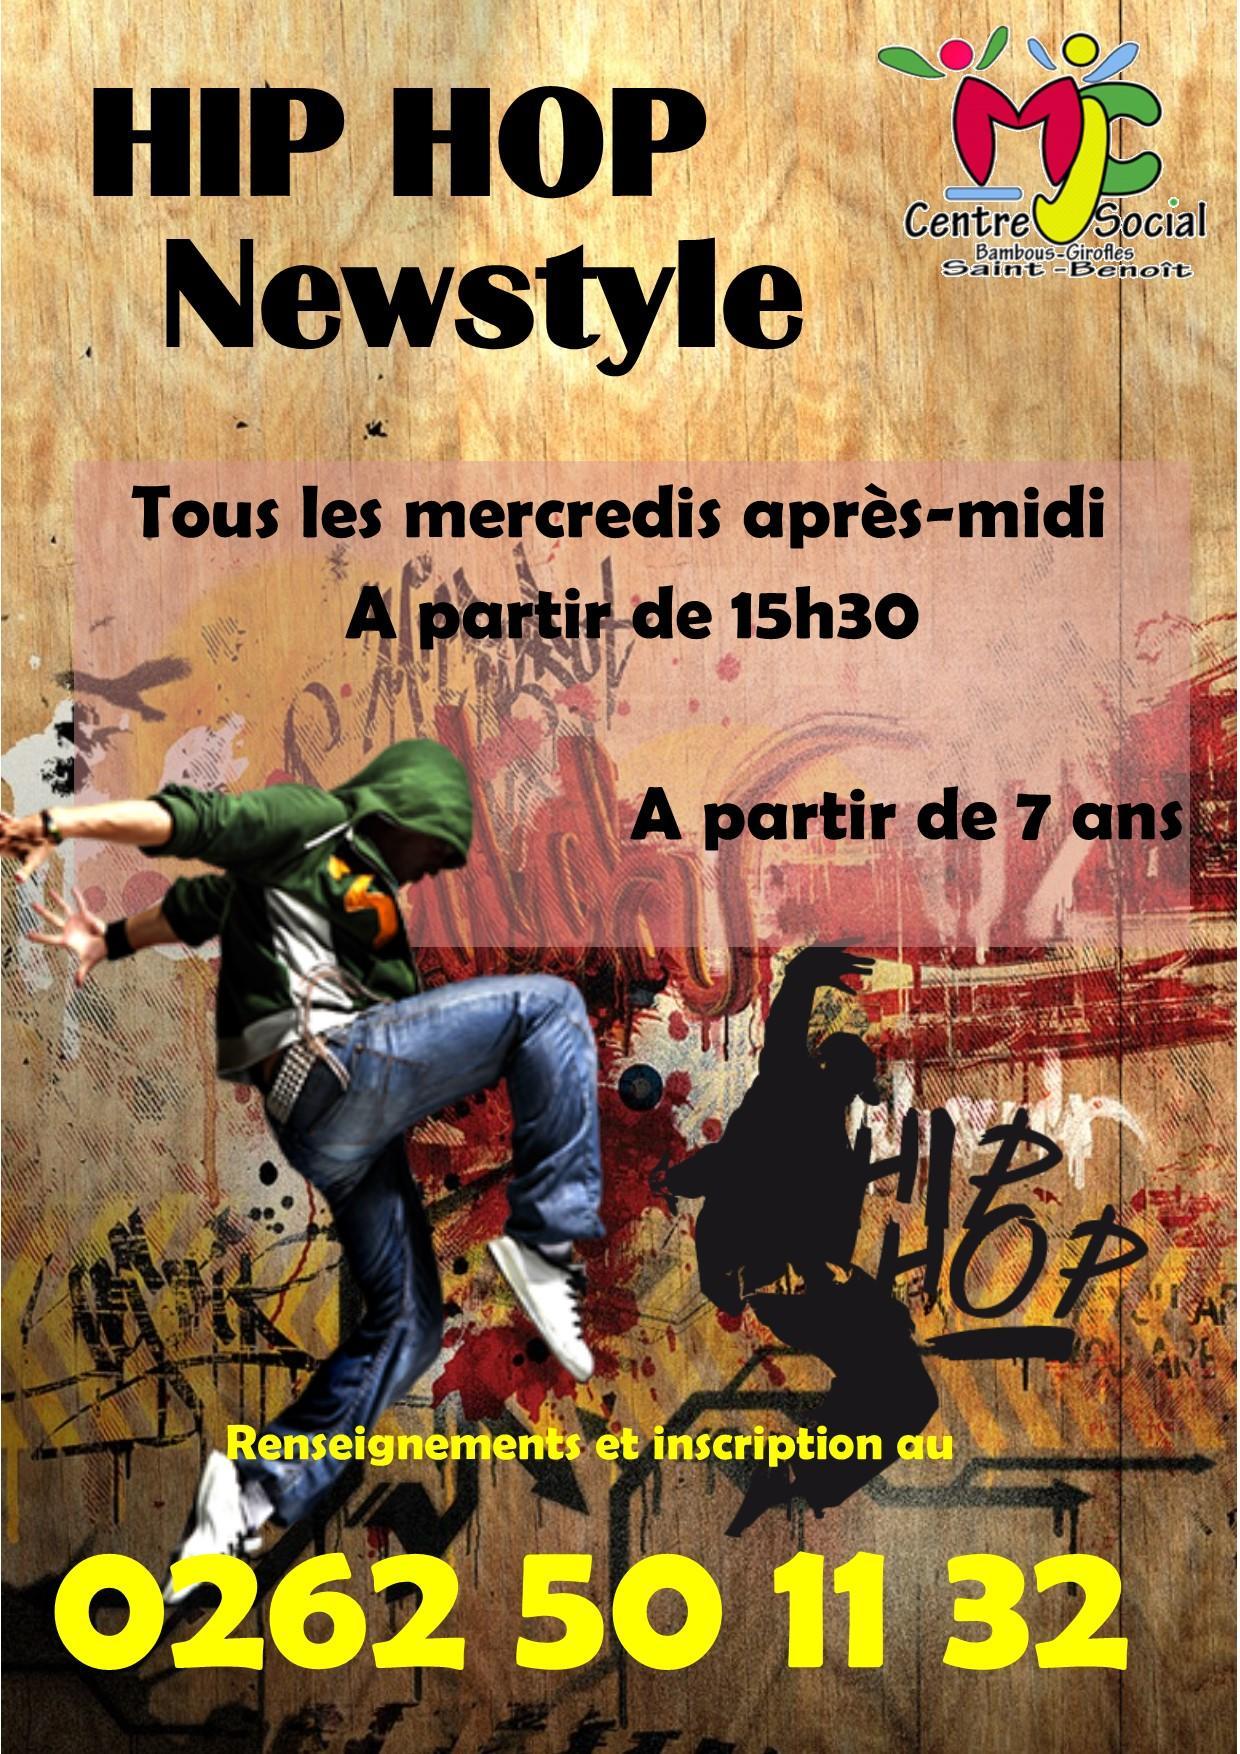 Hip hop newstyle 1